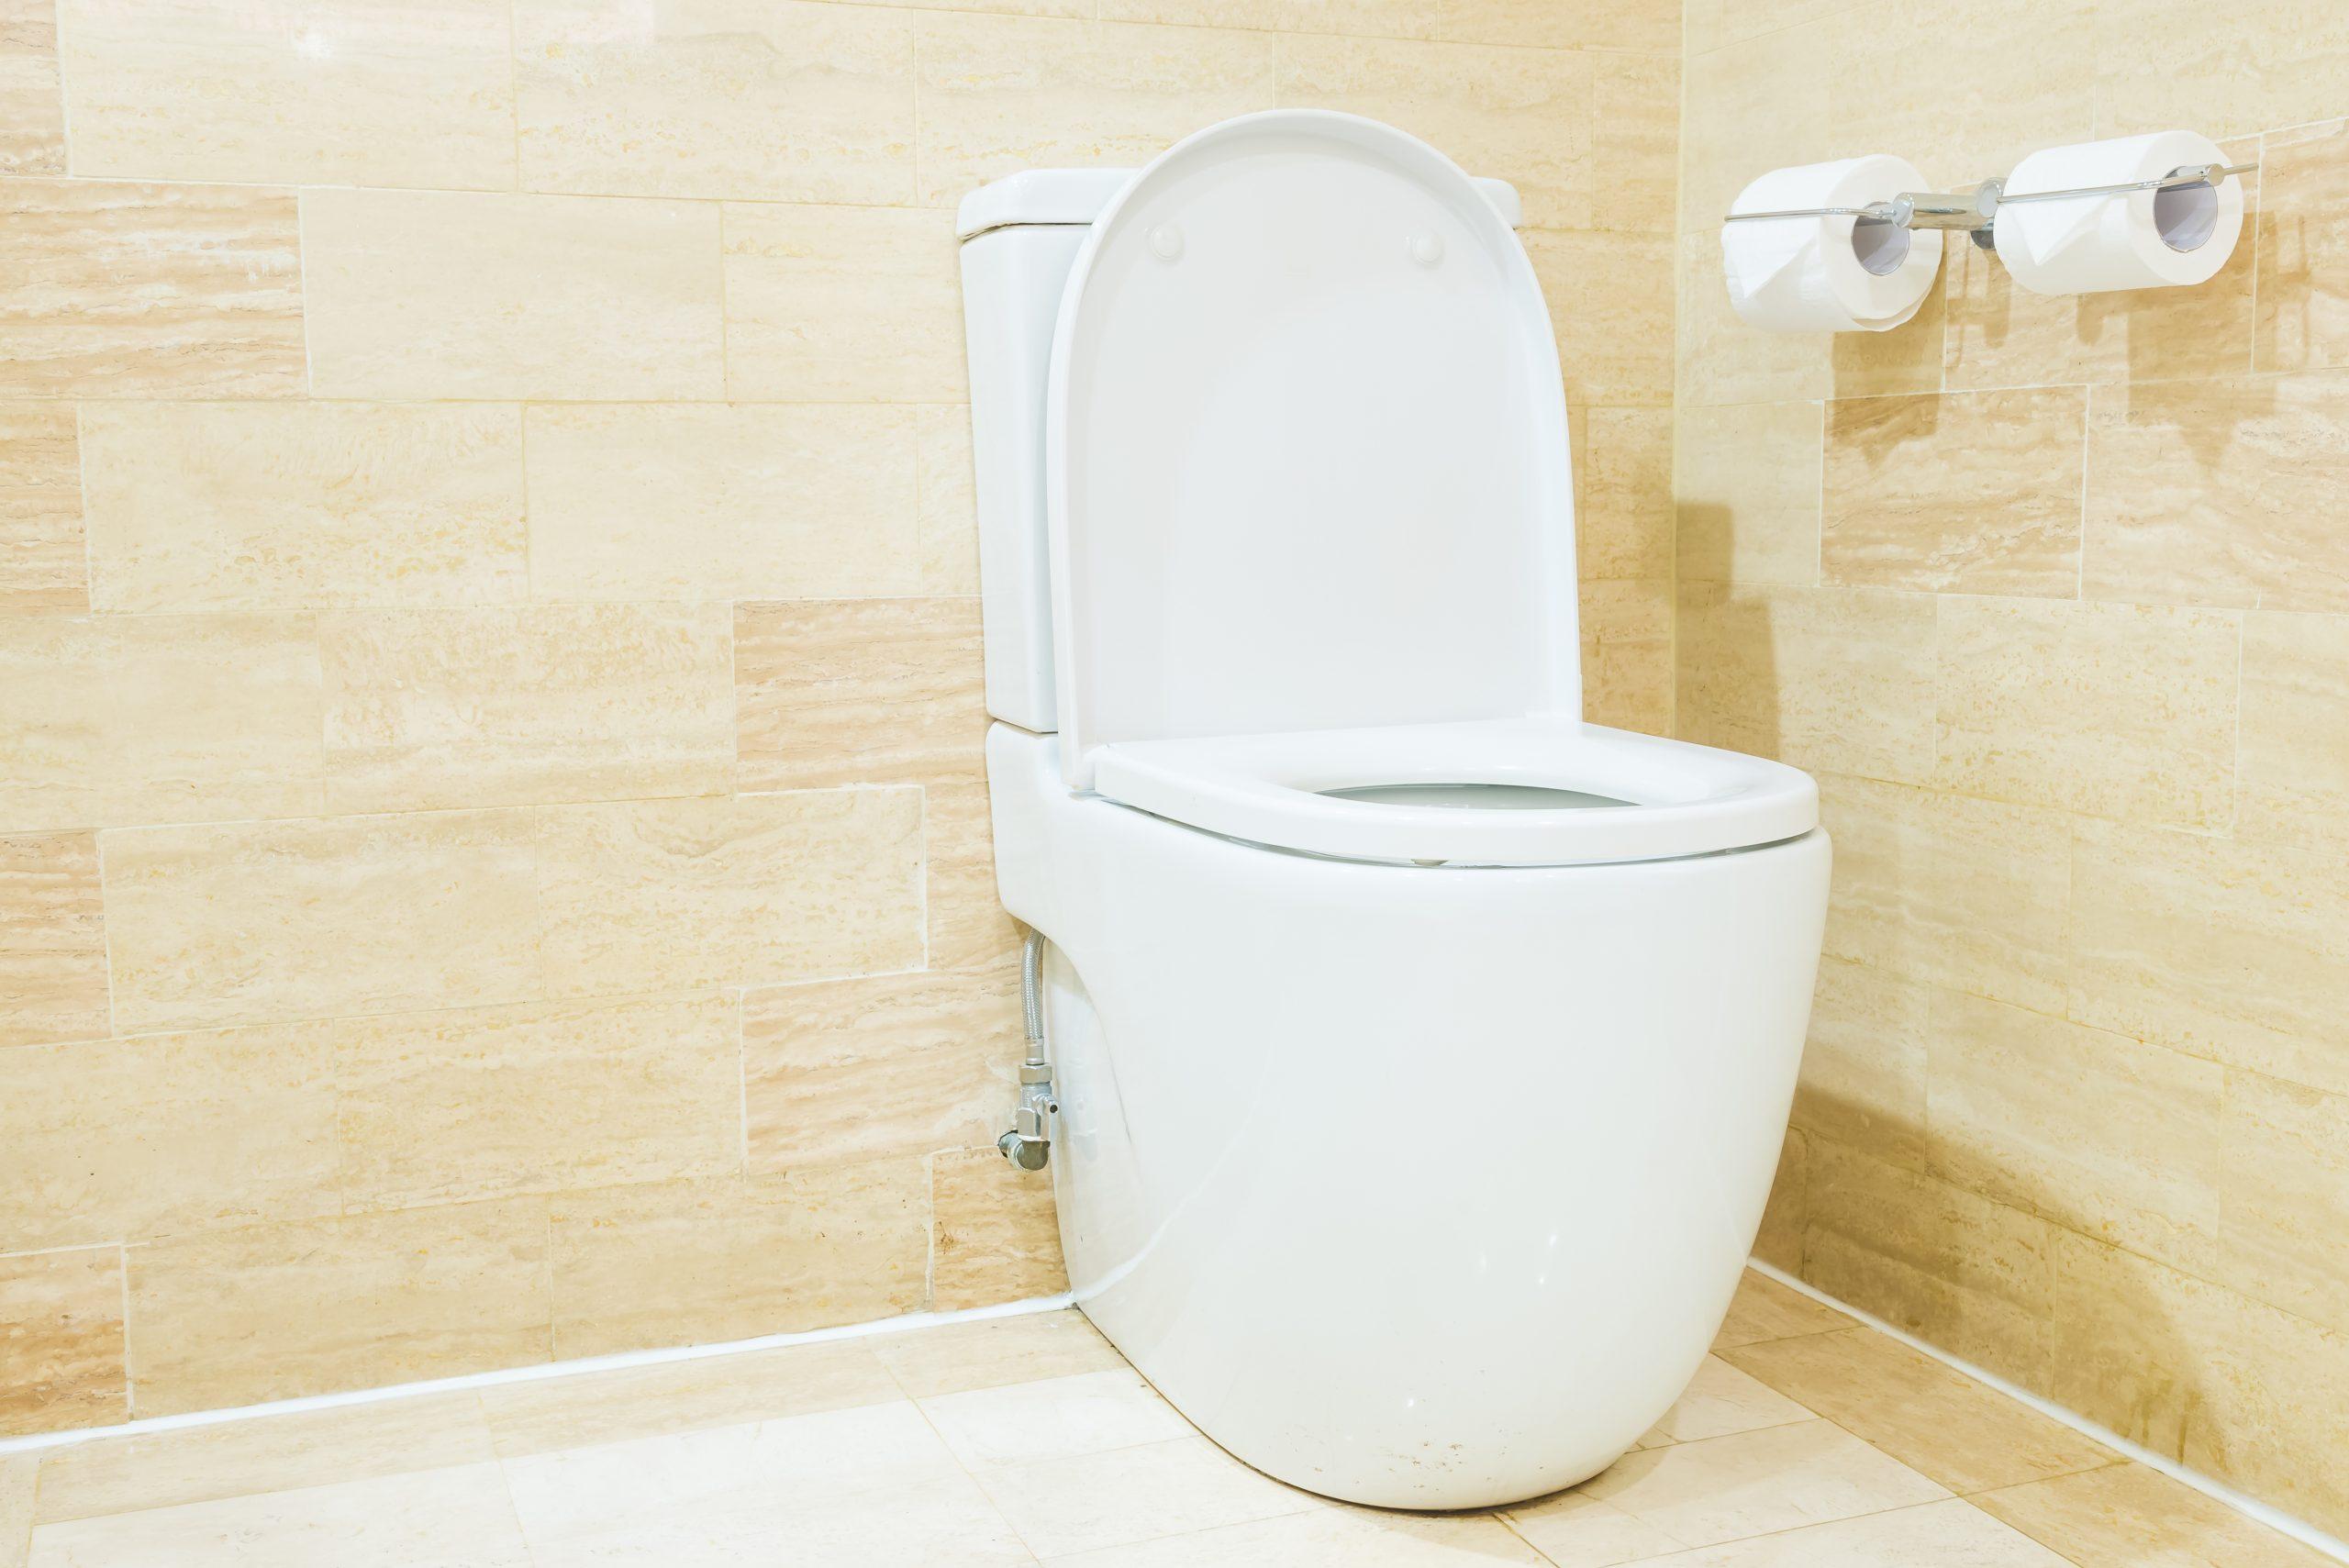 Best Toilet for Large Bowel Movements